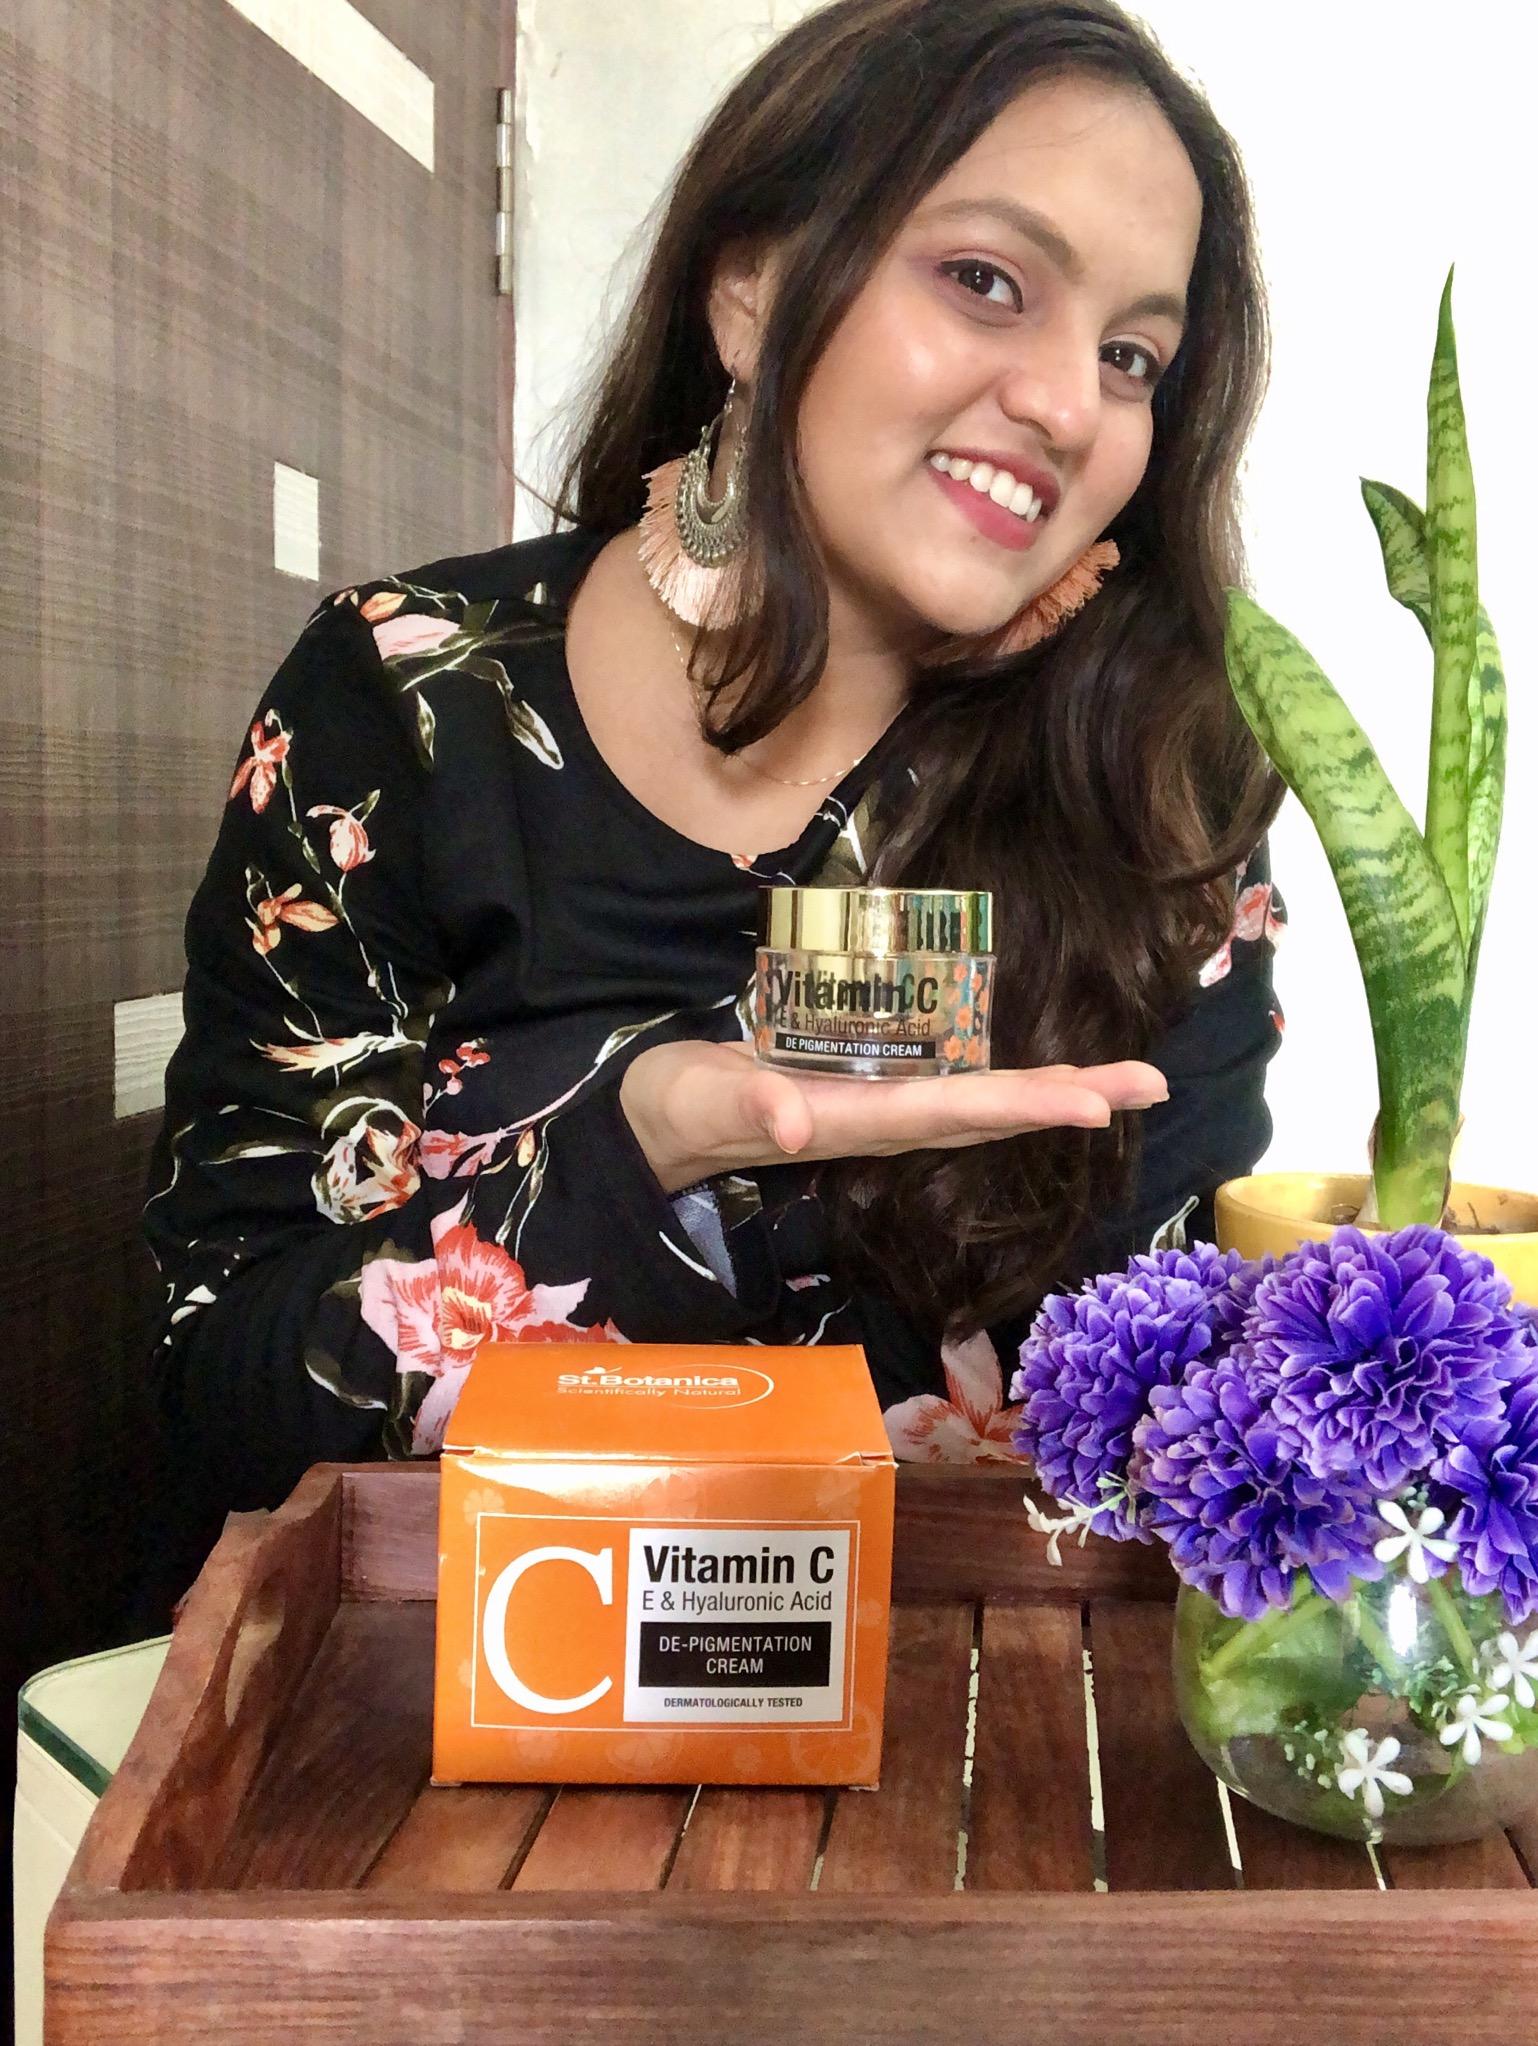 St.Botanica Vitamin C, E & Hyaluronic Acid DePigmentation Cream-Great product-By mansigandhi98